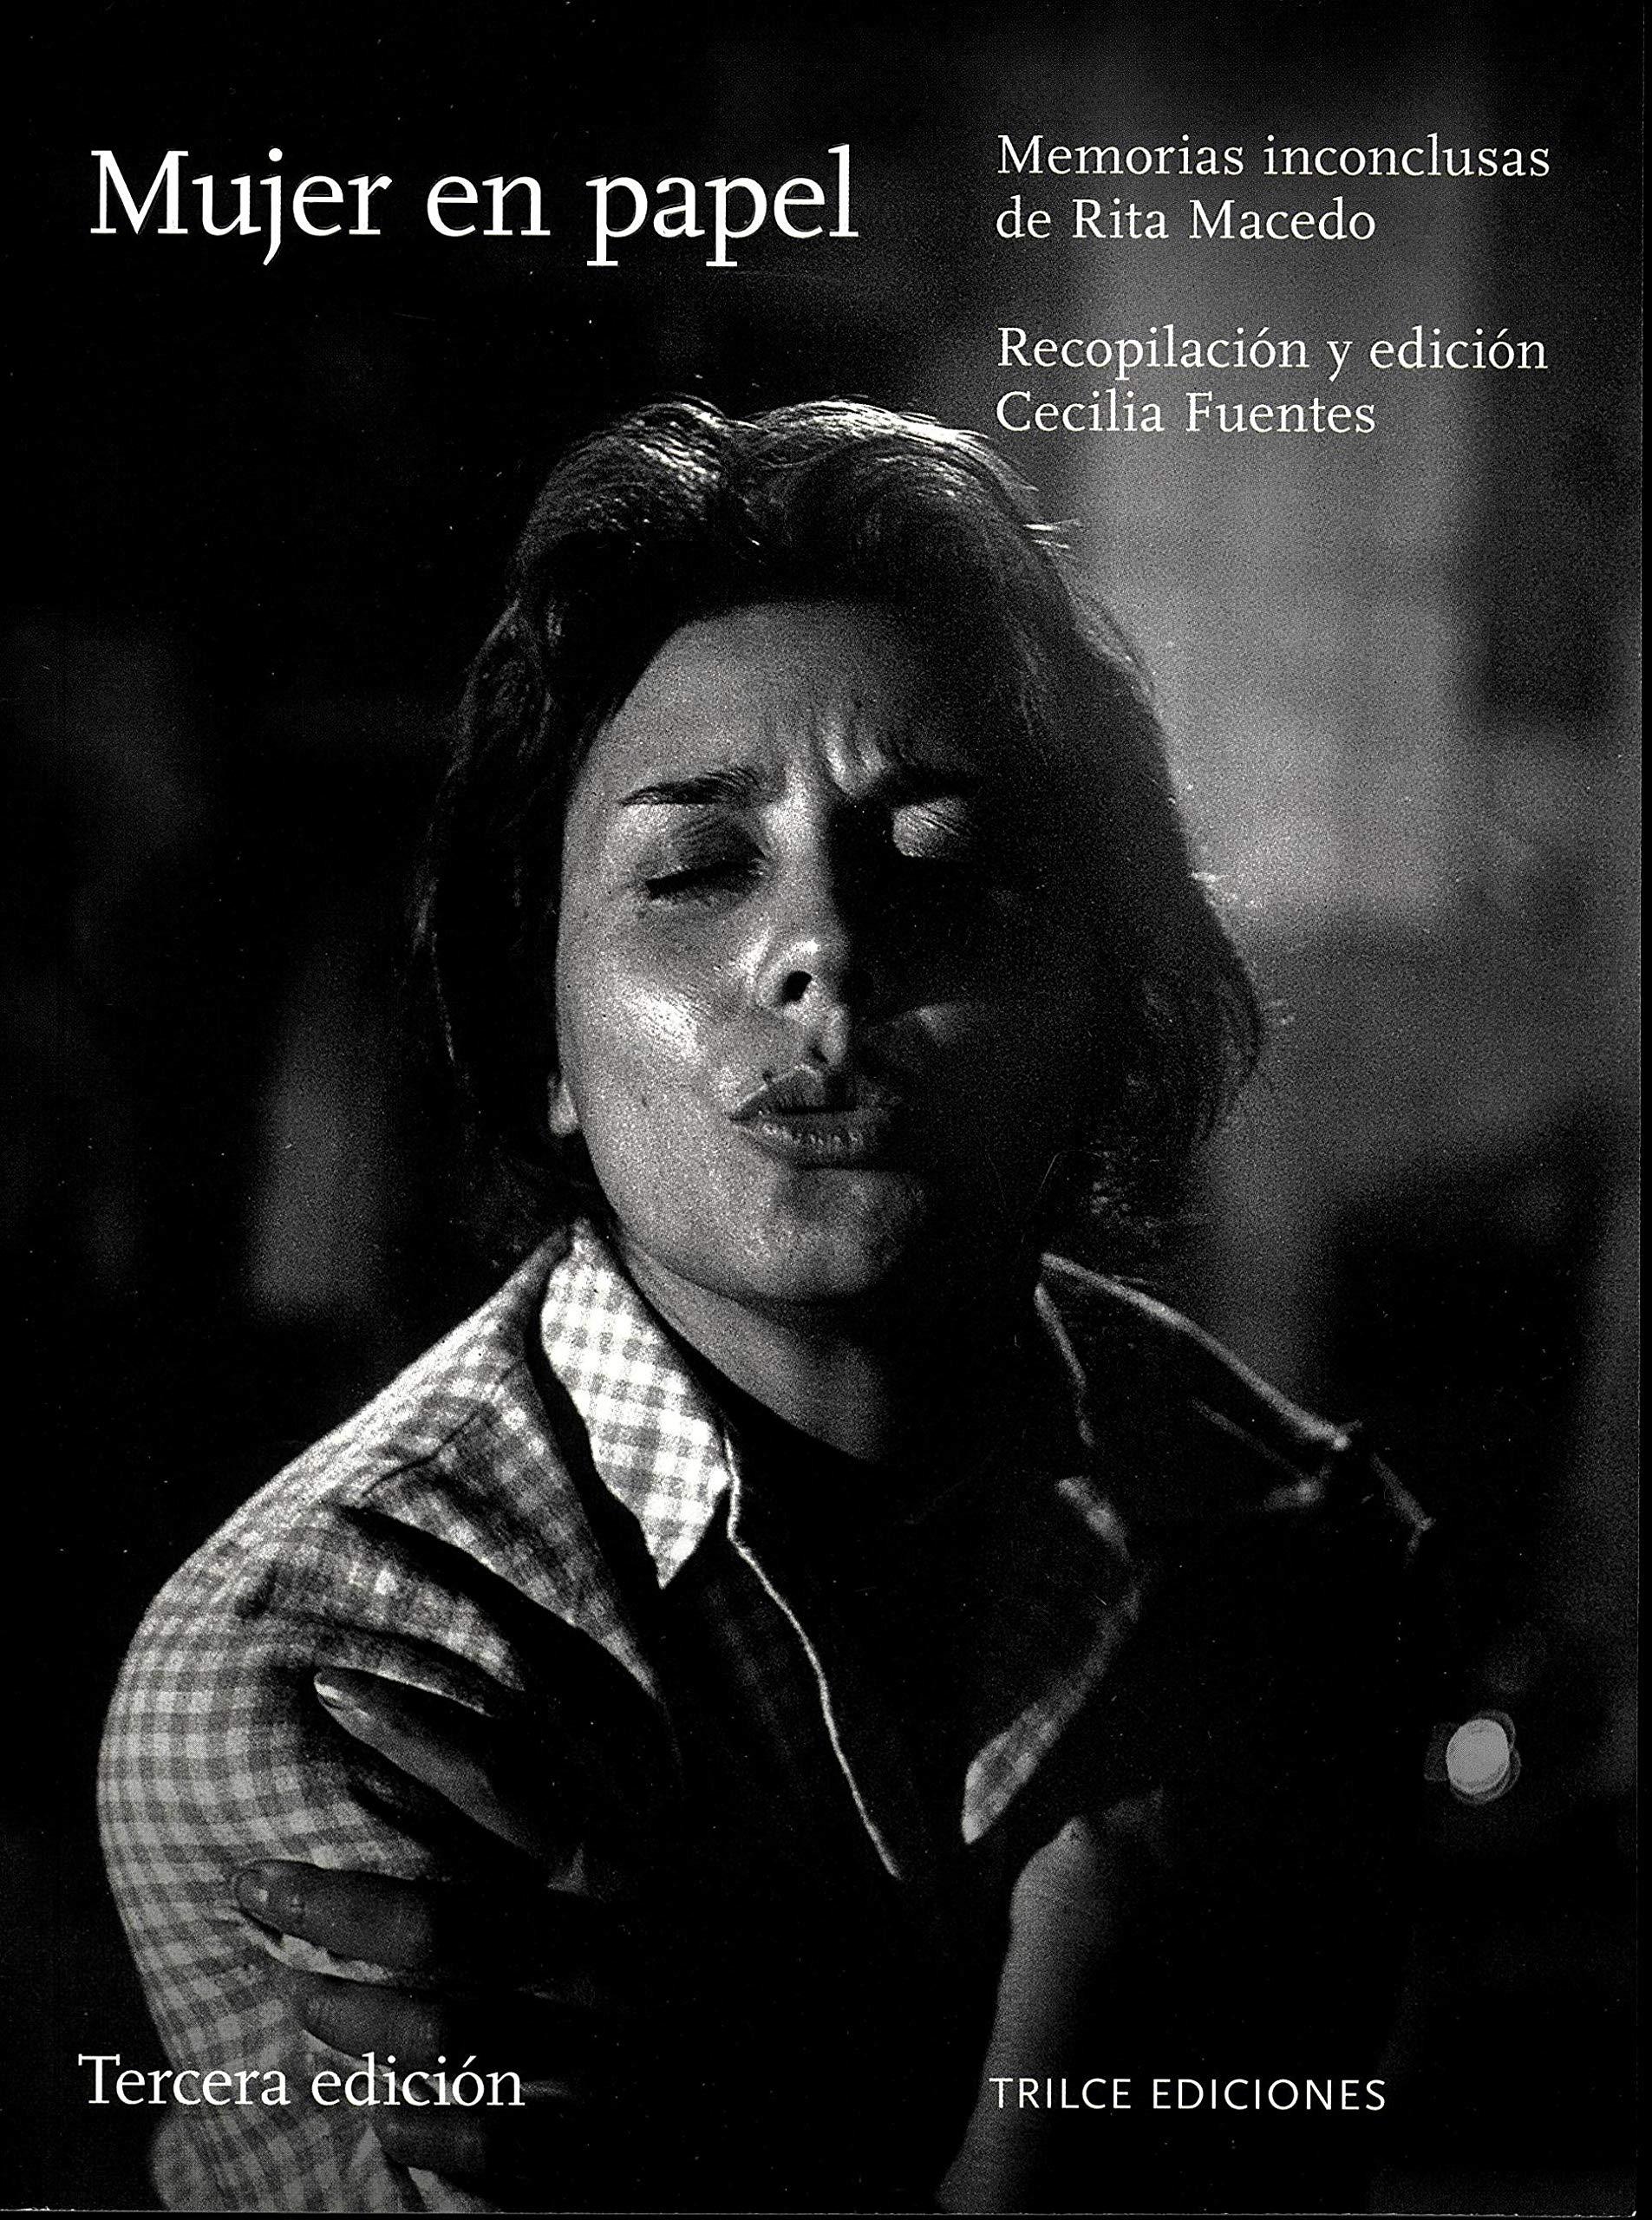 Mujer-en-papel:-Memoria-inconclusas-de-Rita-Macedo-(Adriana)